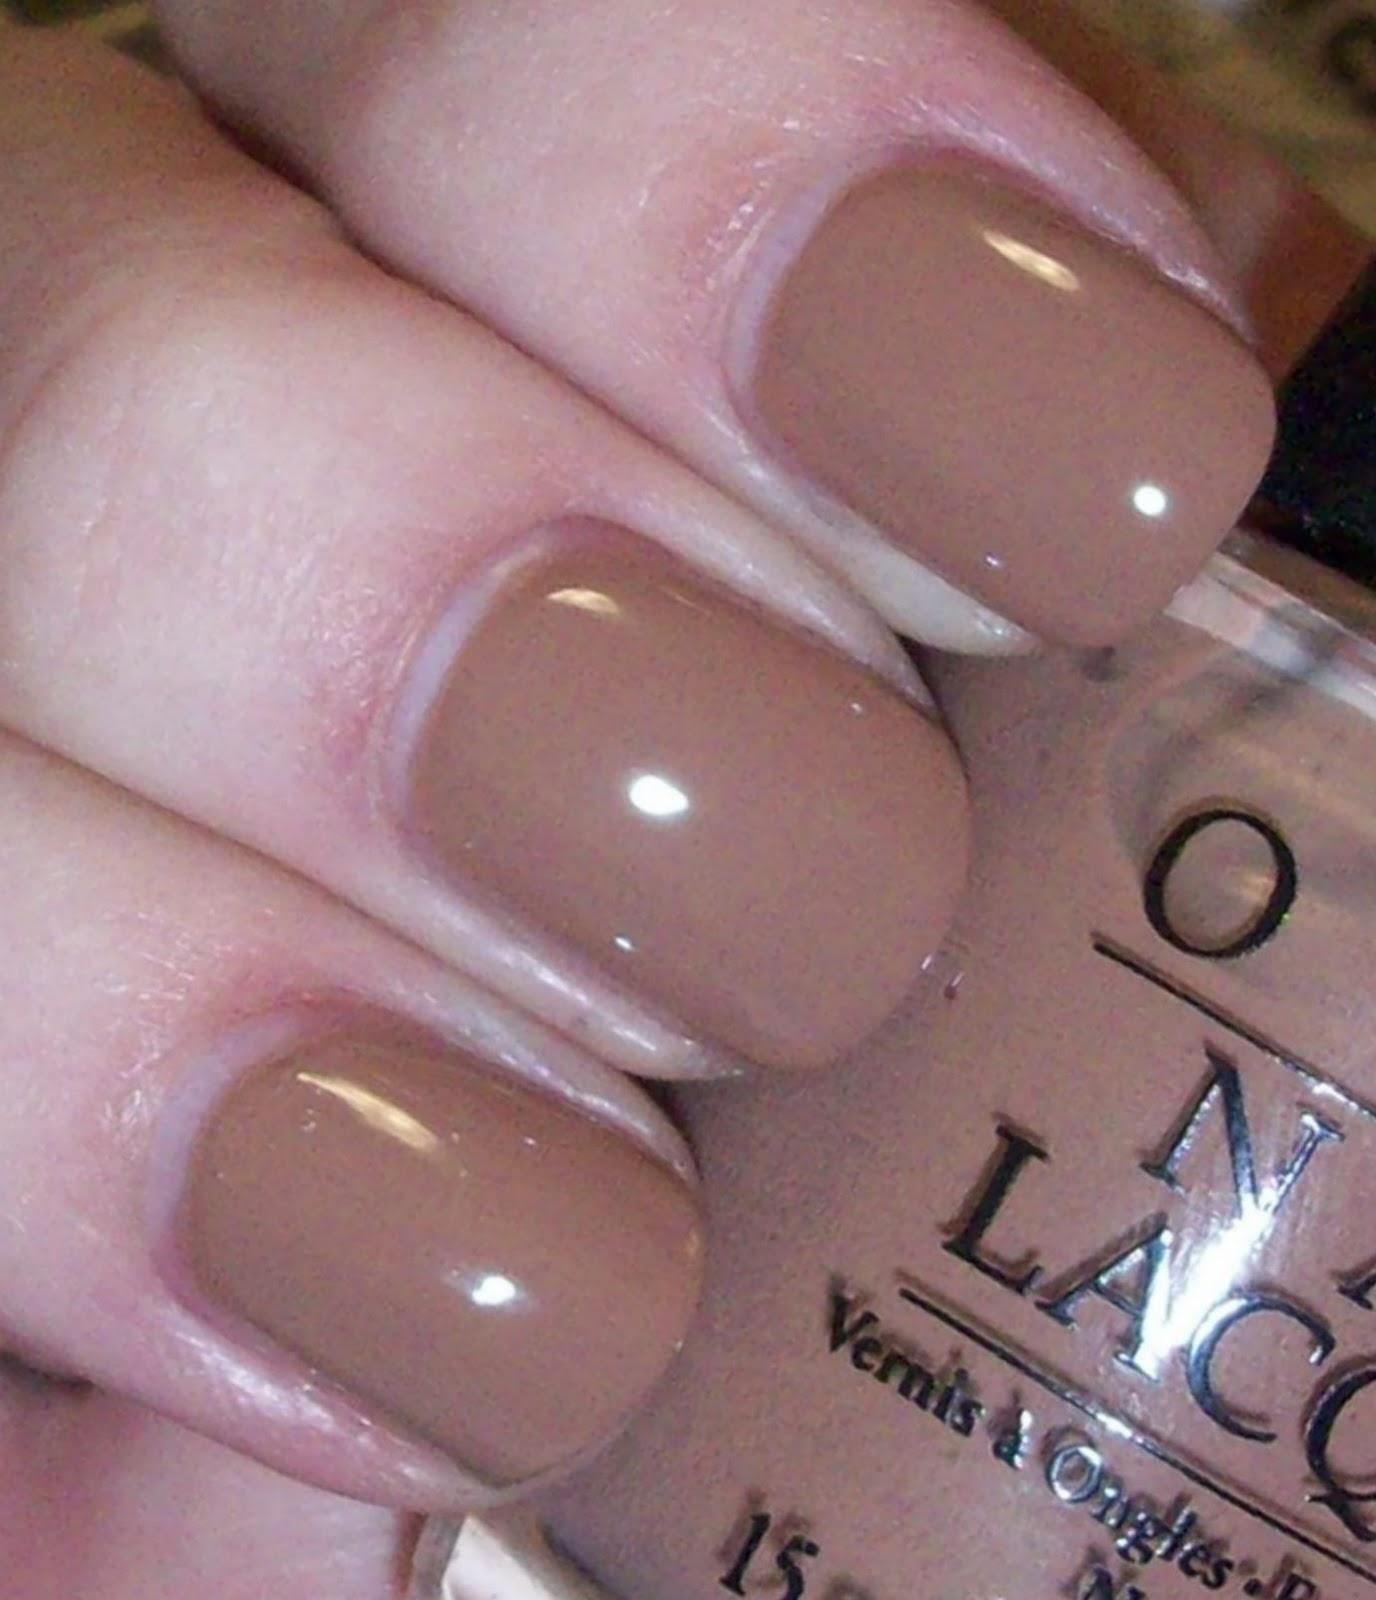 Tan colored acrylic nails